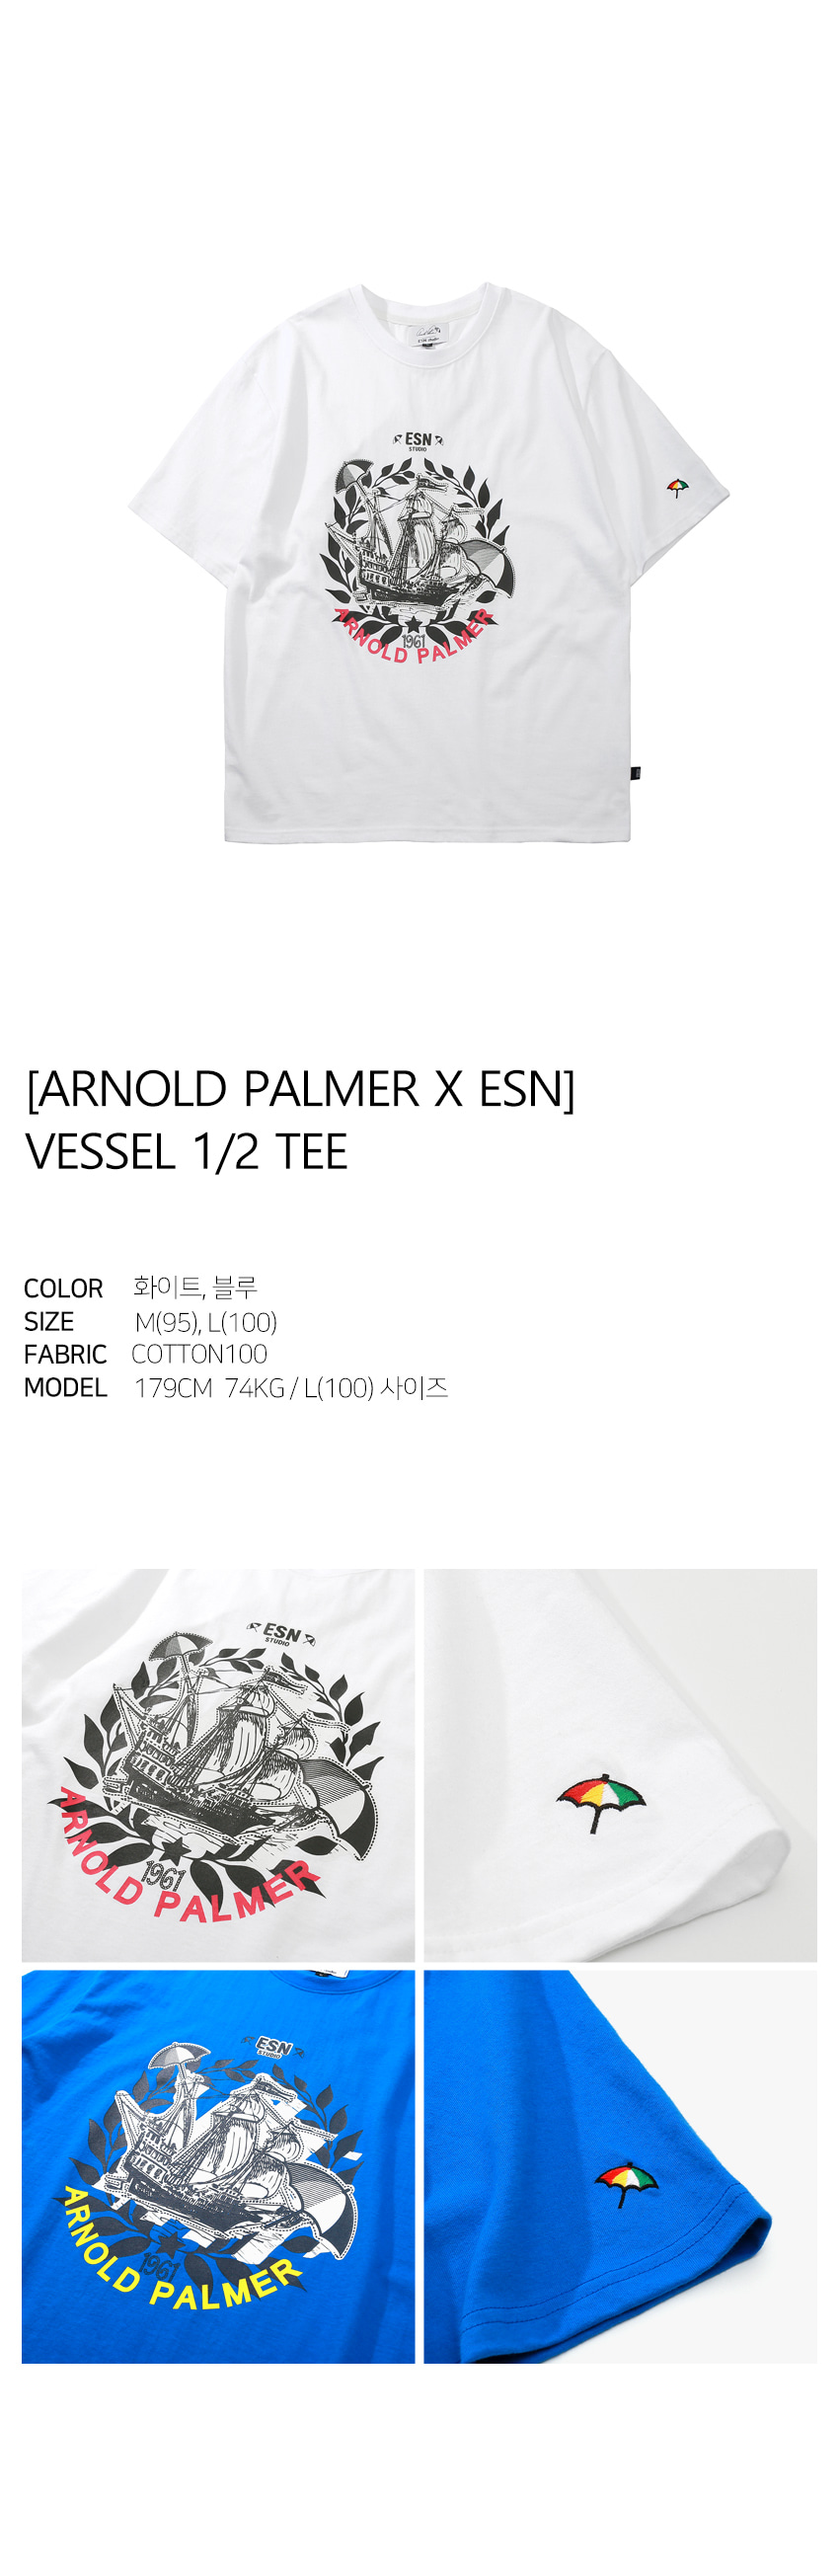 [ARNOLD PALMER X ESN] Vessel 1/2 Tee white